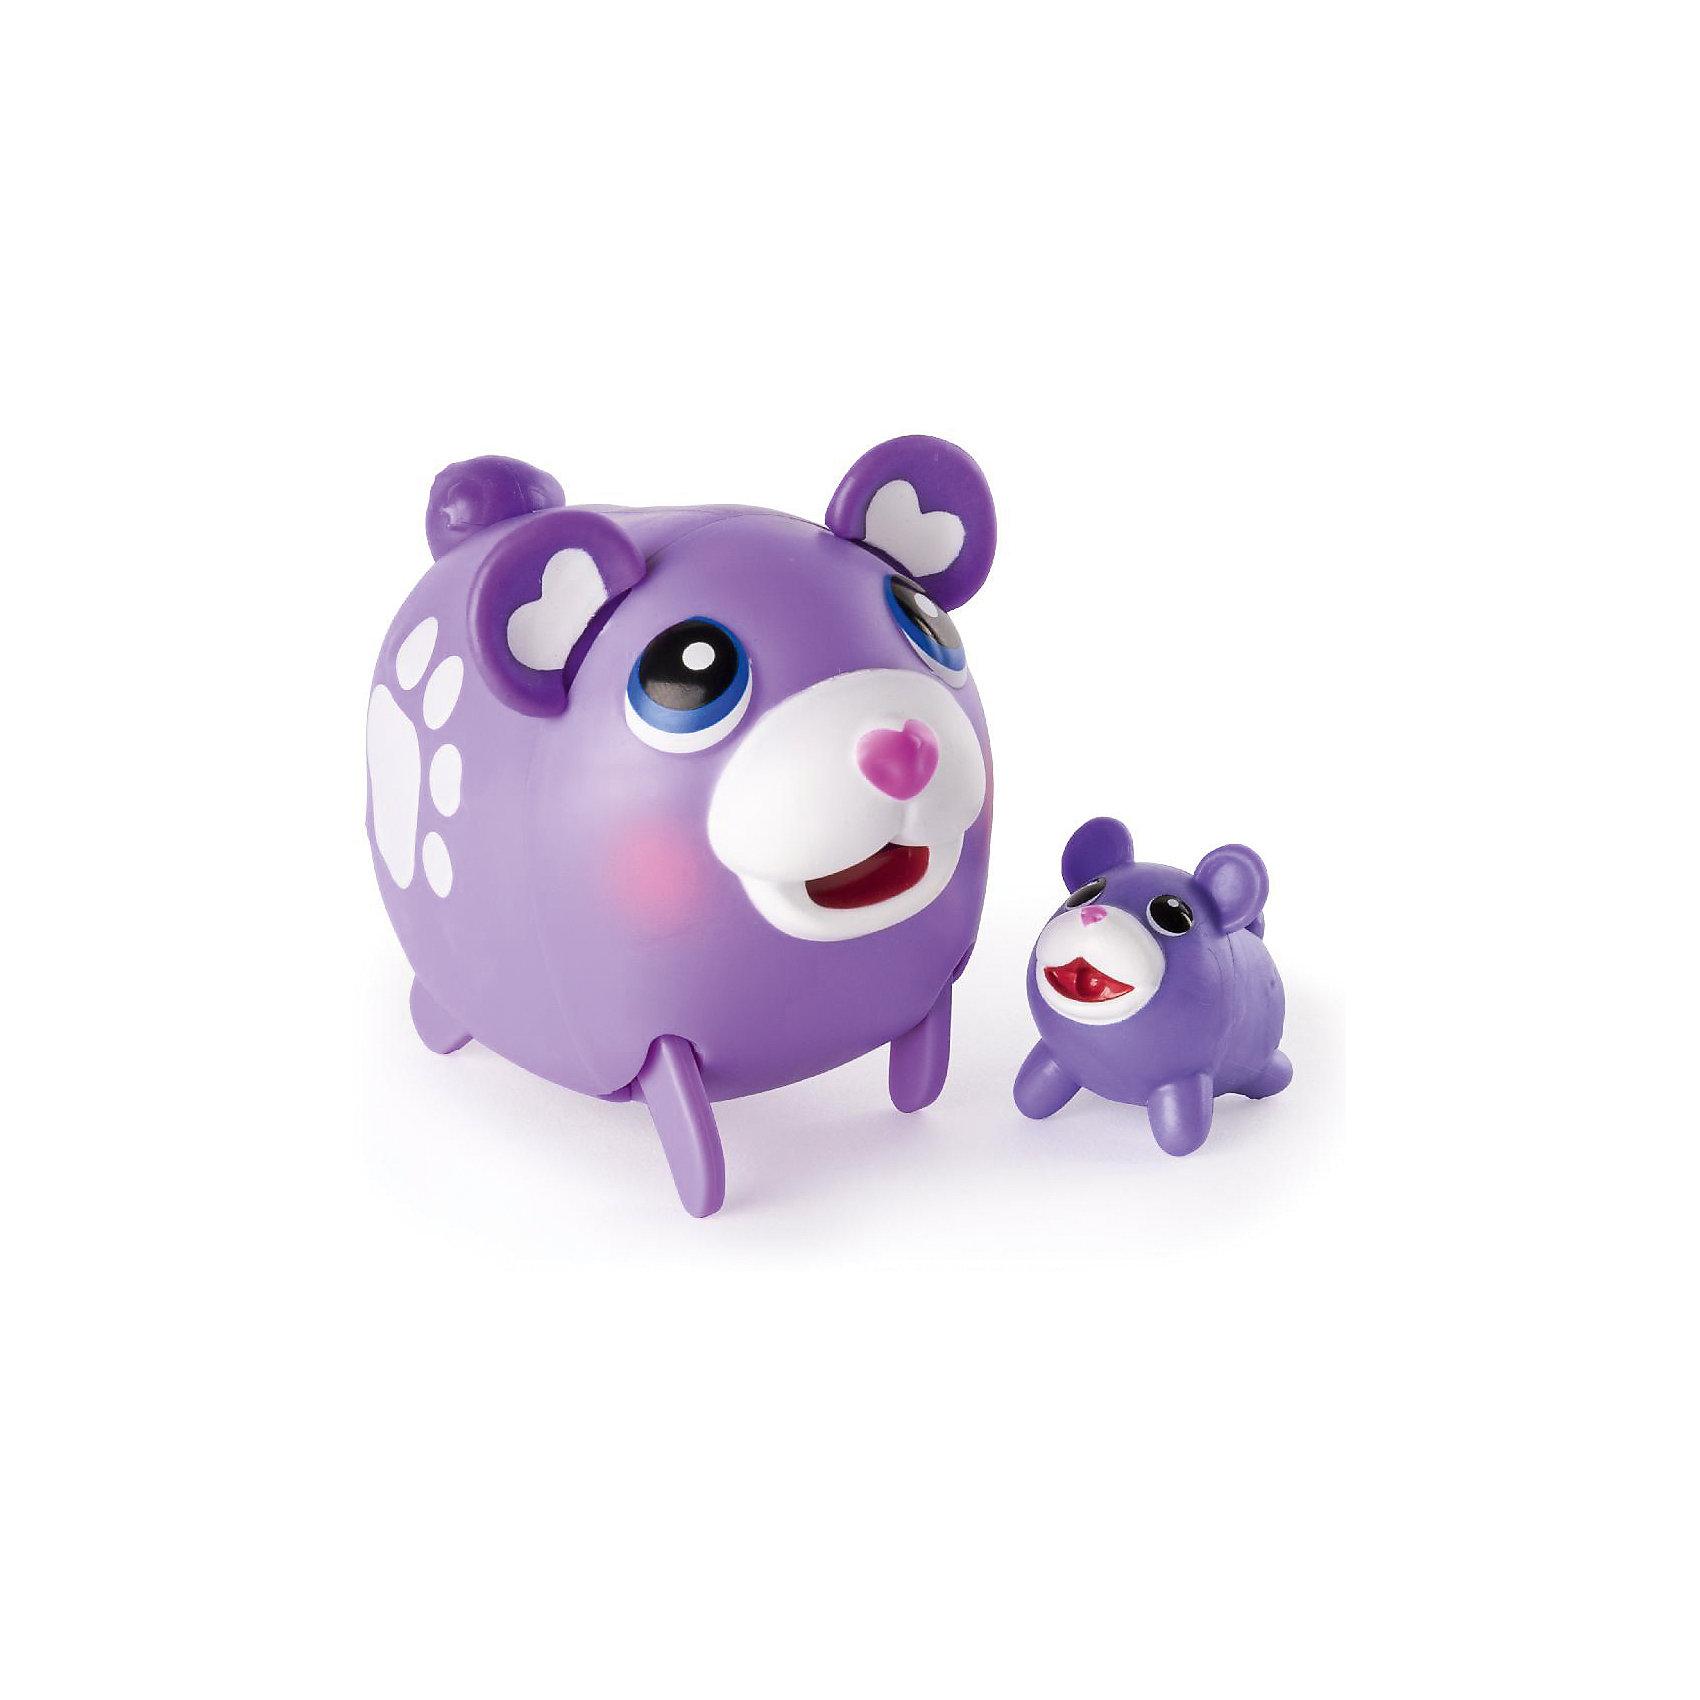 Chubby Puppies Коллекционная фигурка Мишка, Chubby Puppies мишка тед из фильма третий лишний